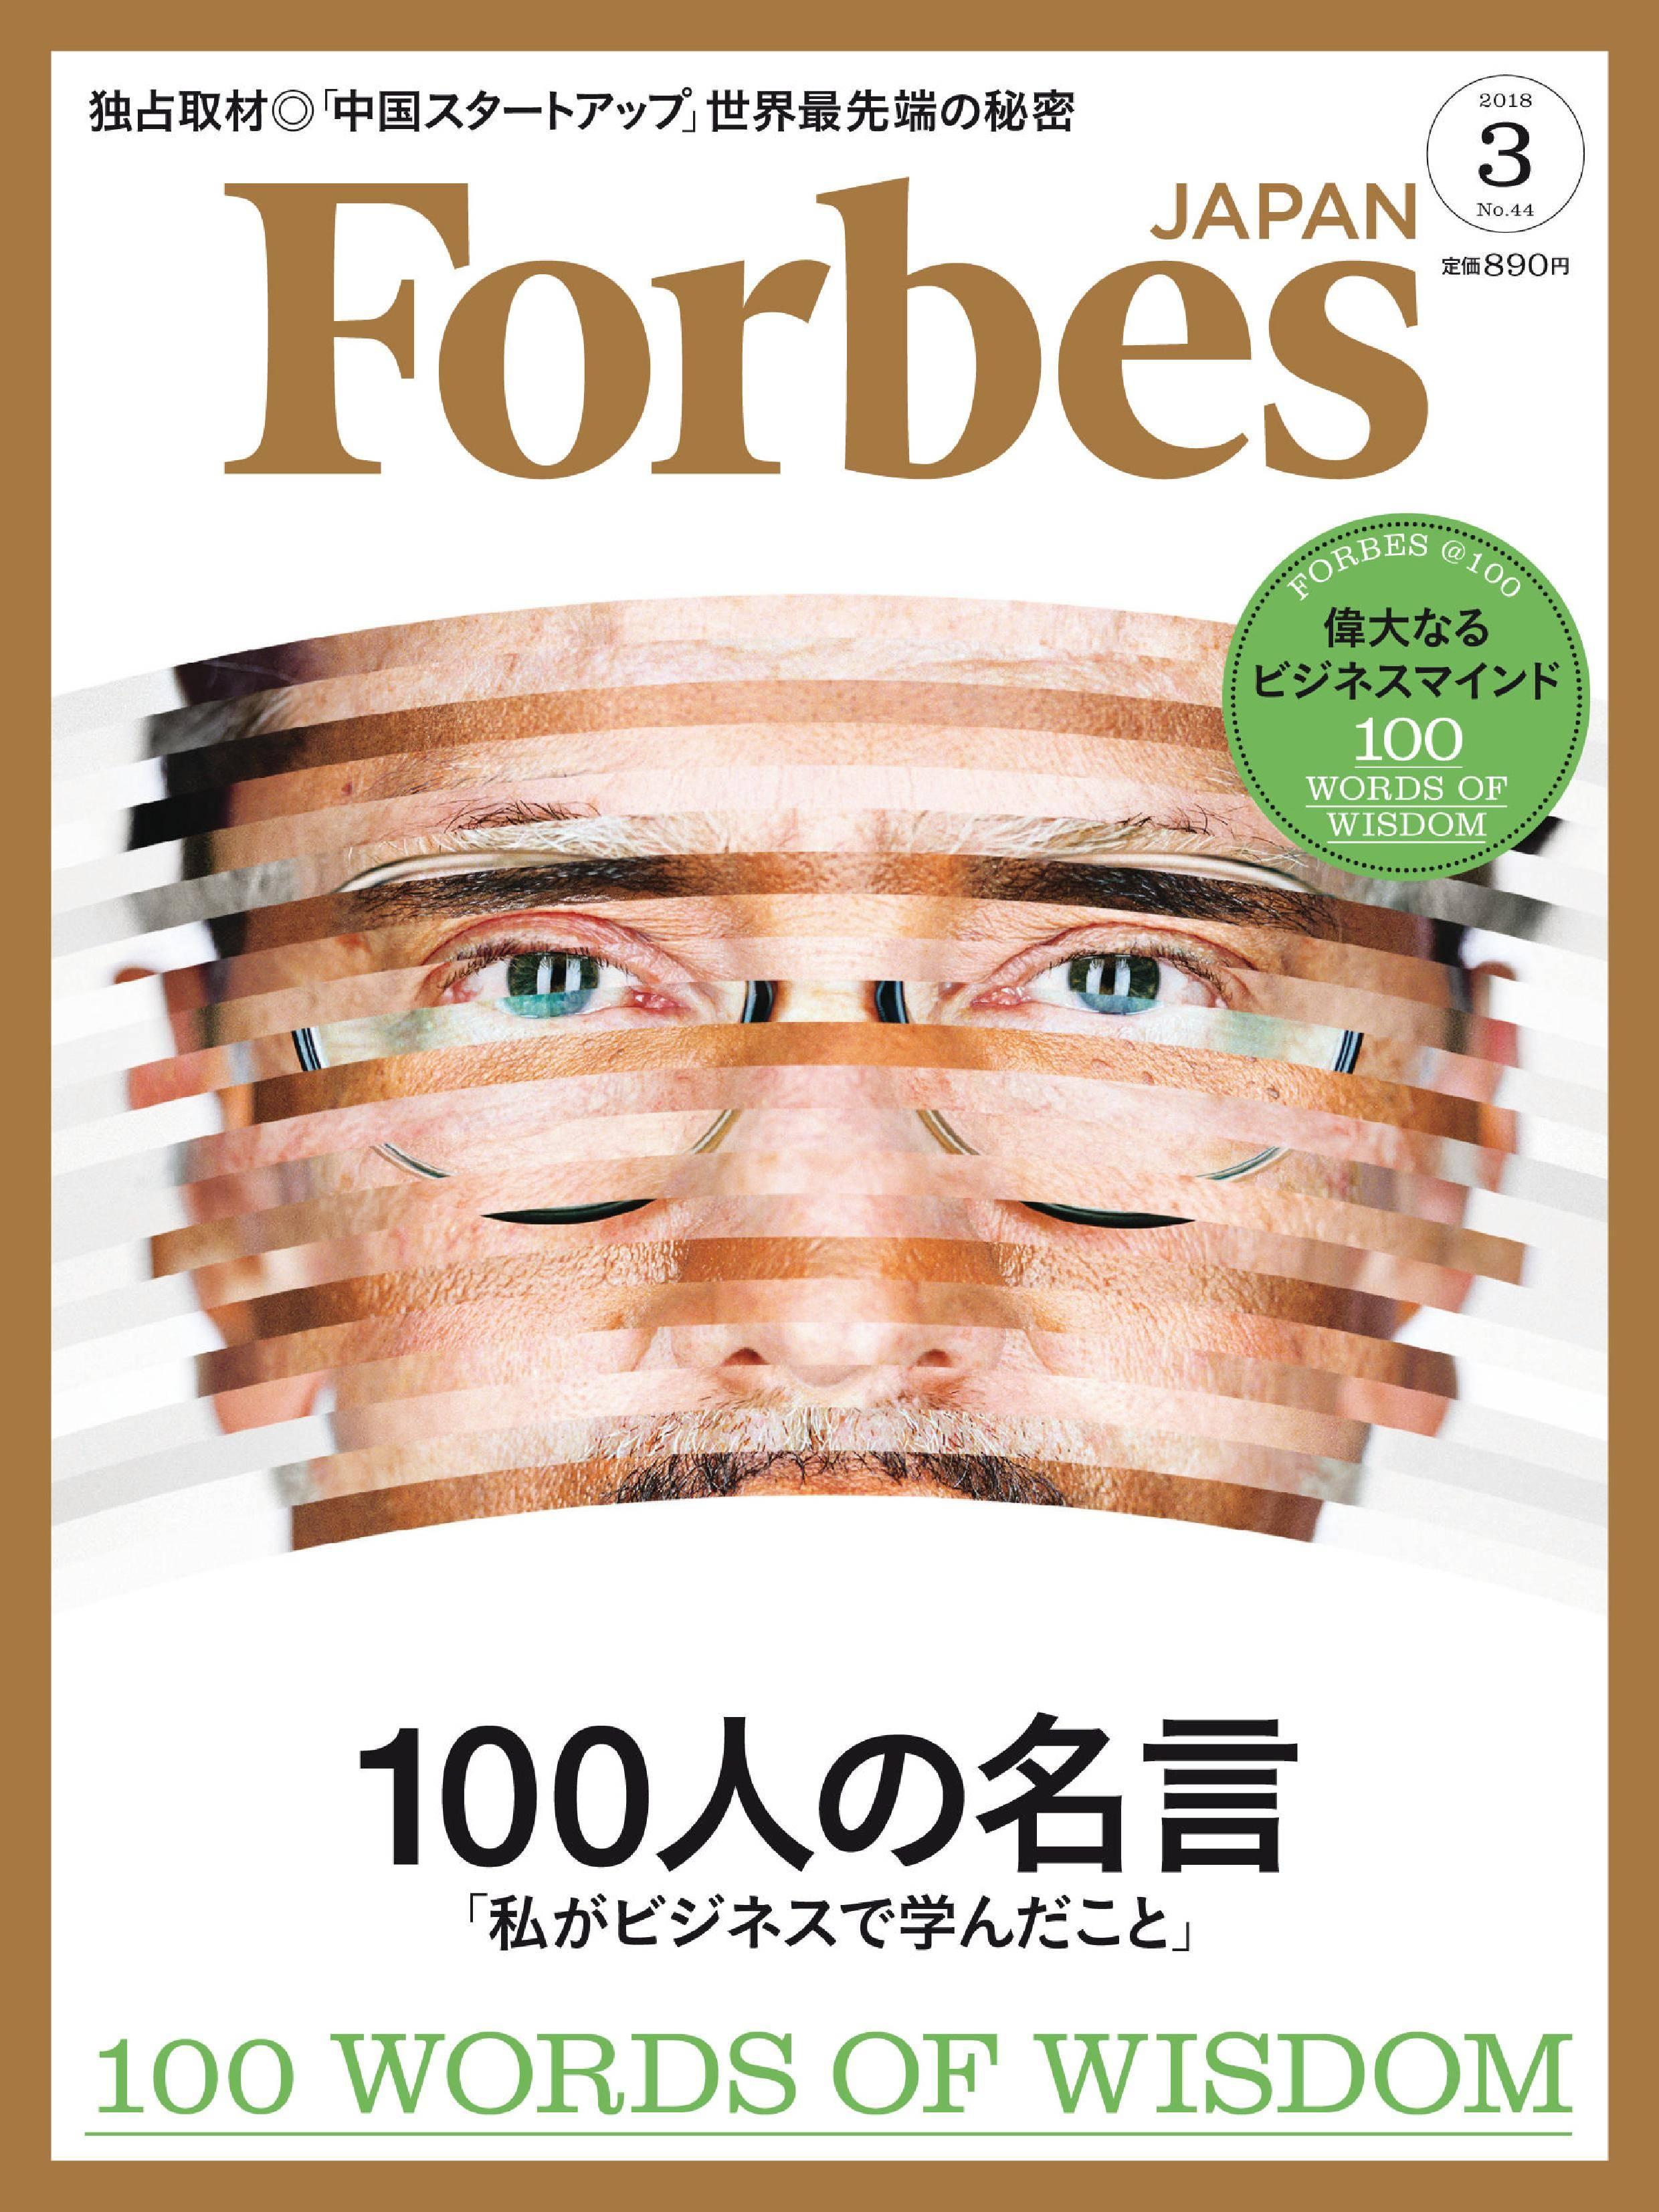 Forbes Japan フォーブスジャパン - 3月 2018